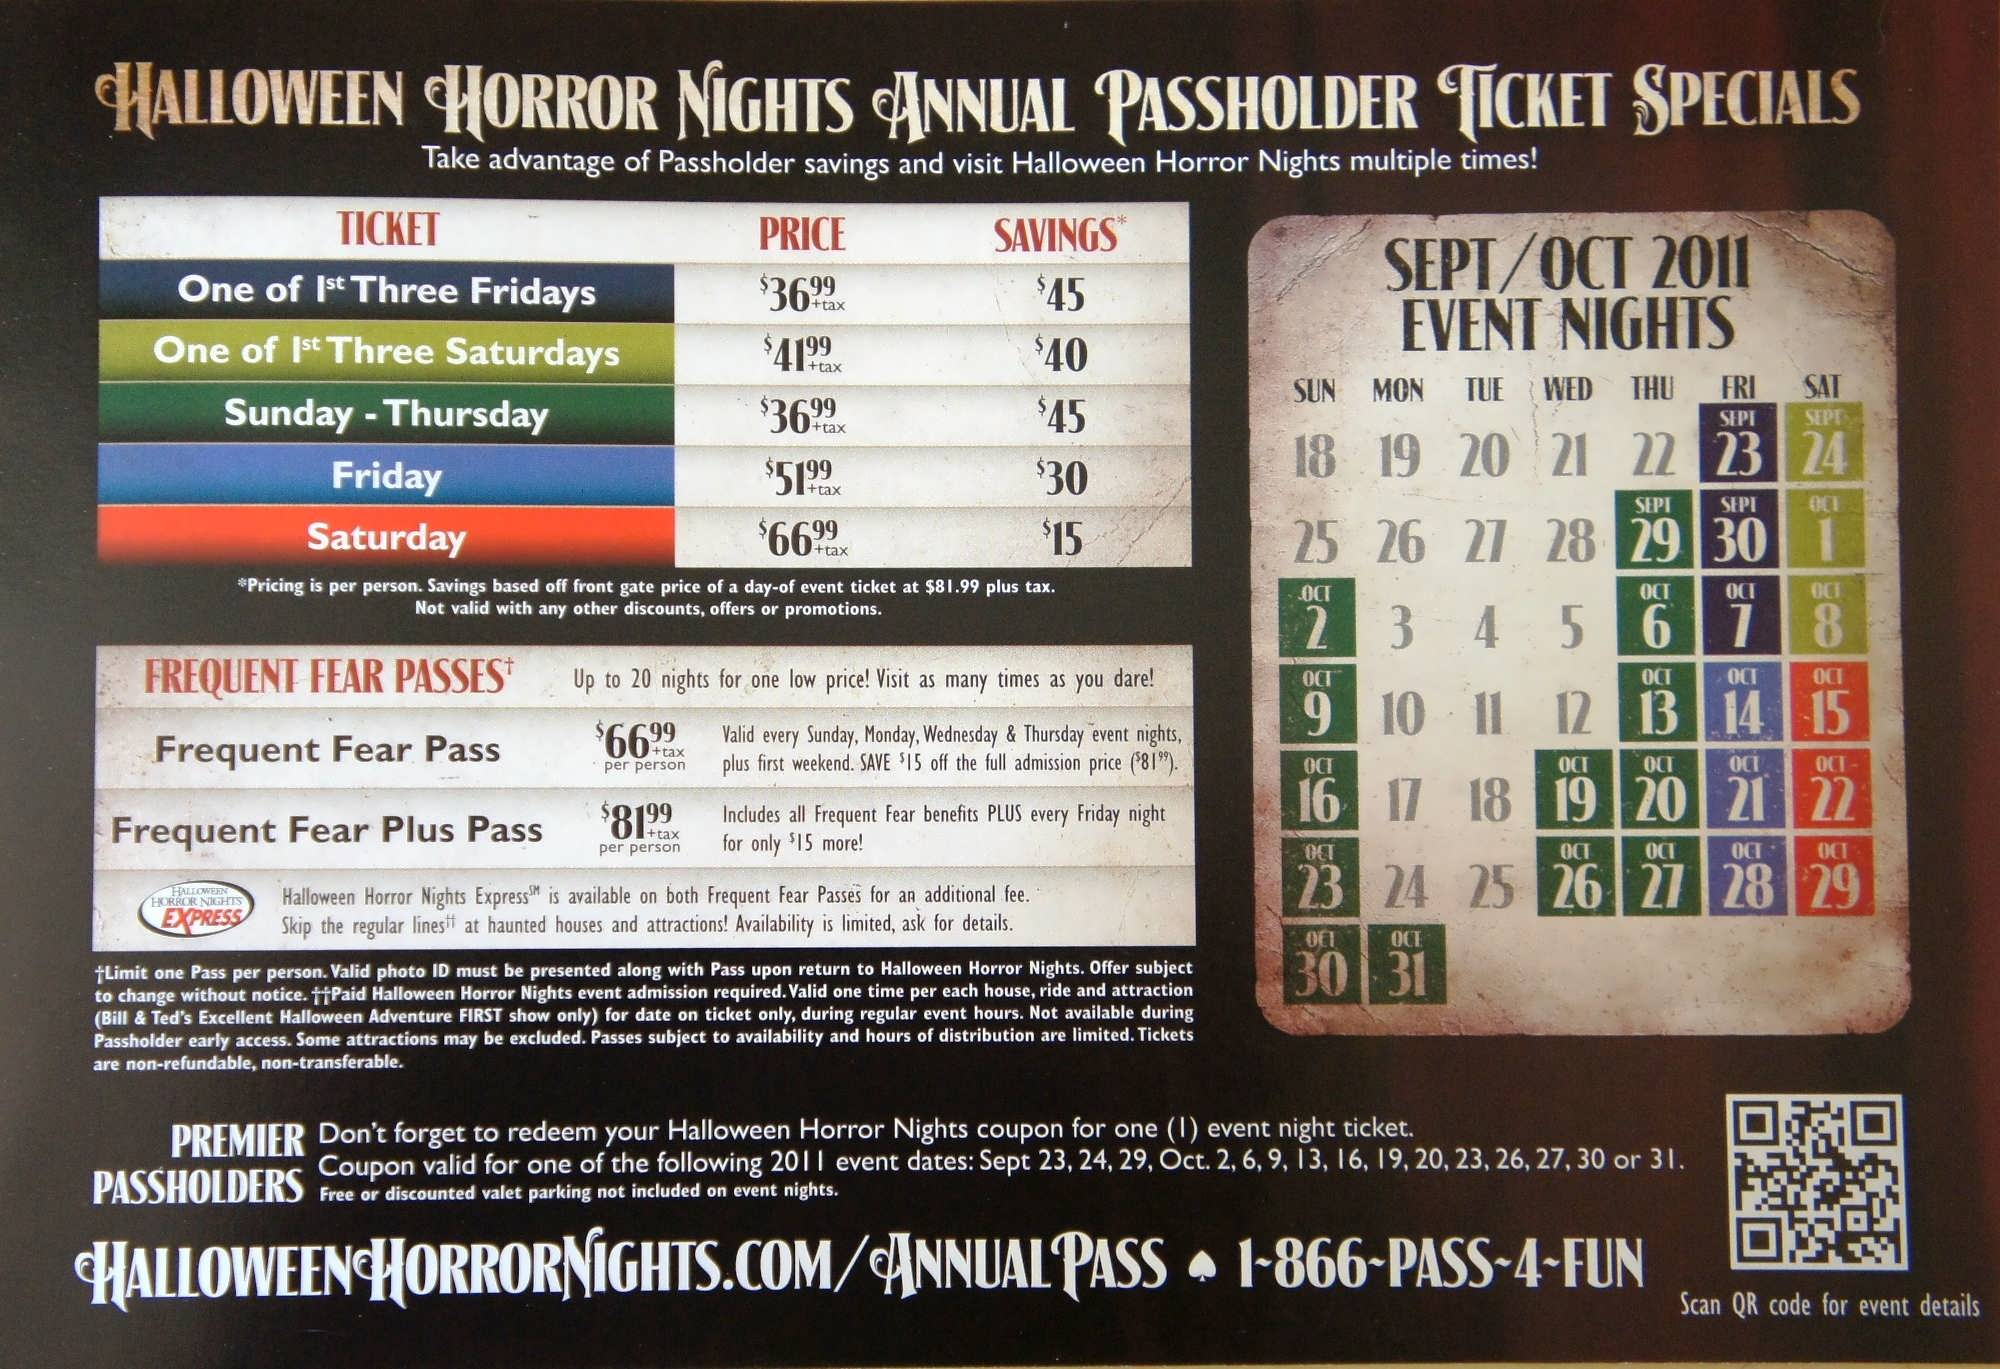 Halloween Horror Nights Passholder Discounts